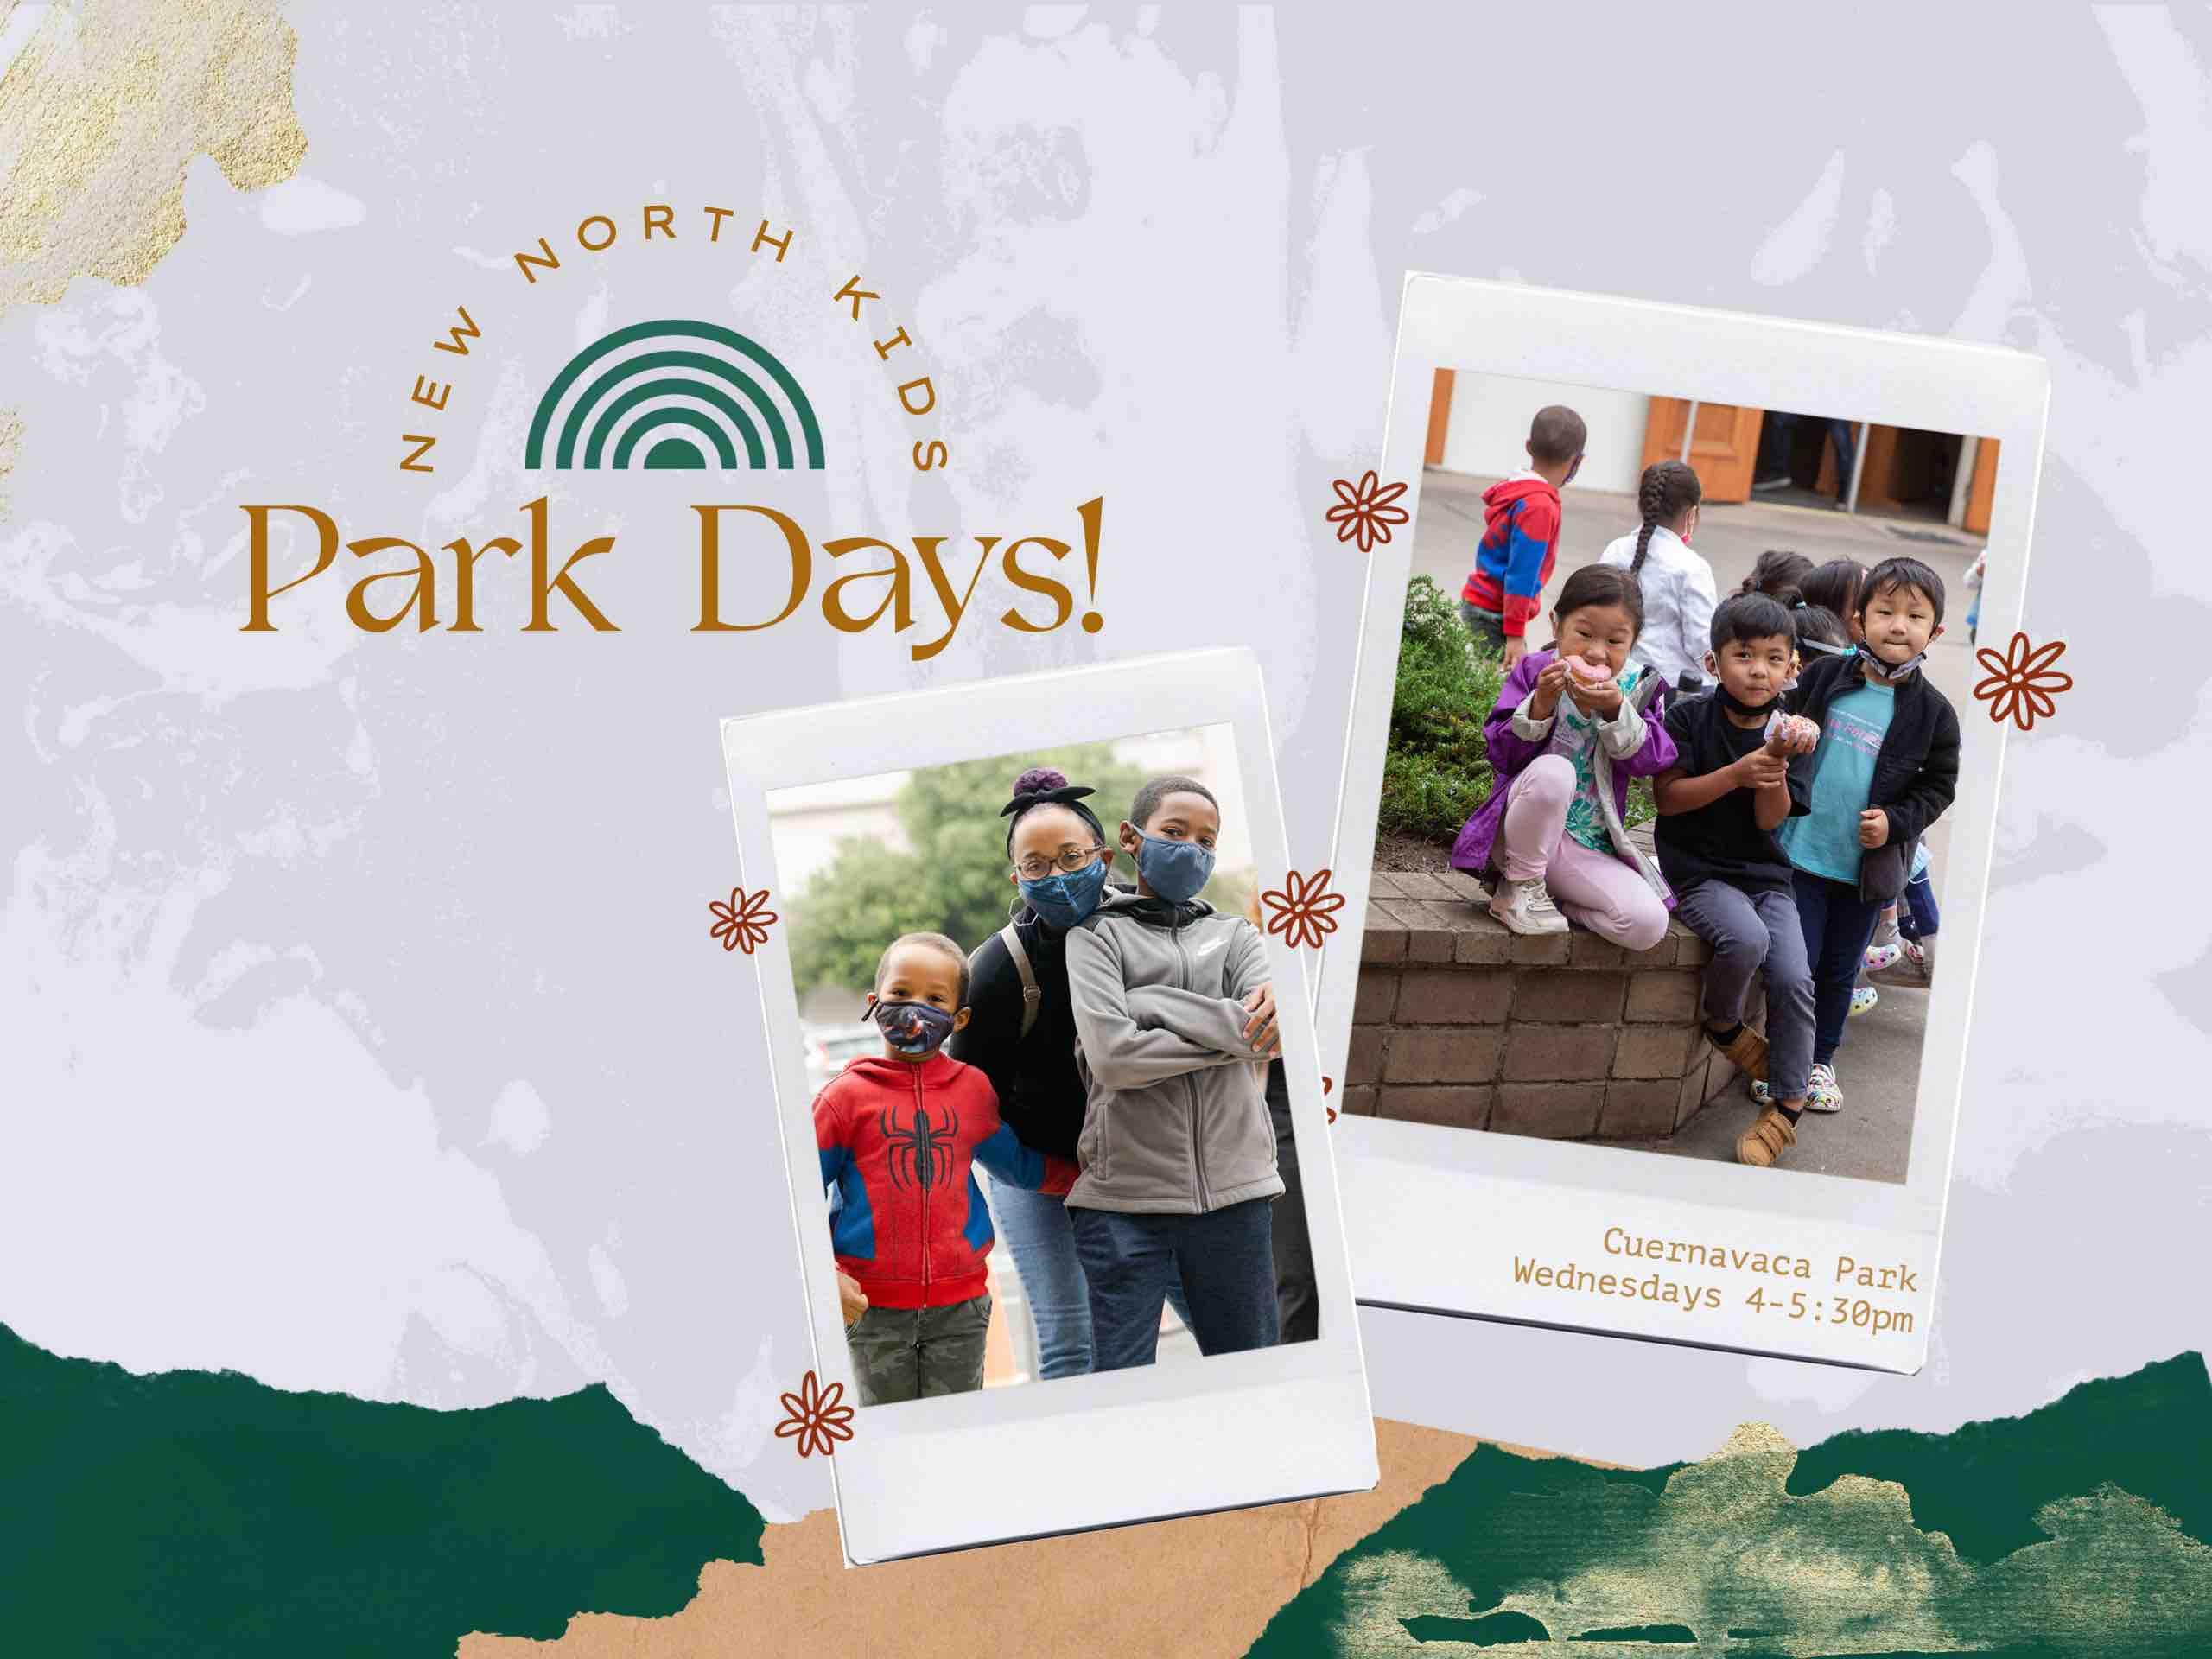 New North Kids Park Days